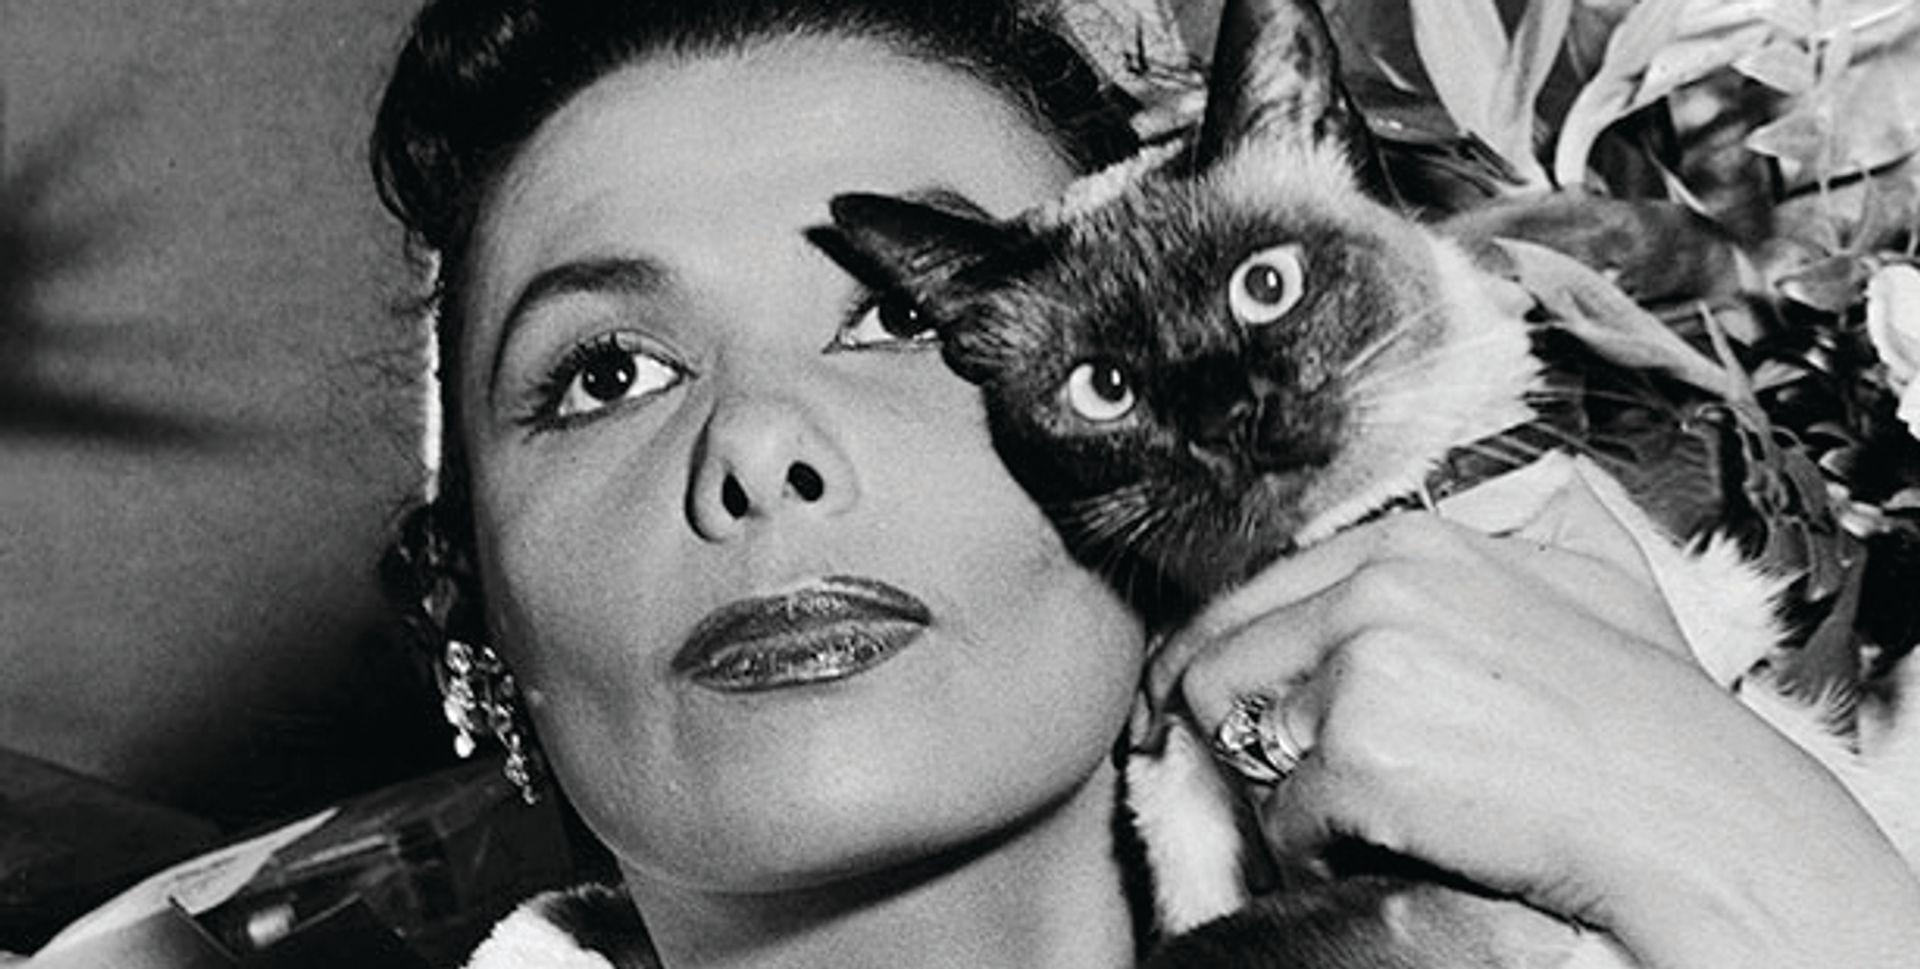 Isaac Sutton photographed the singer Lena Horne for Ebony magazine Isaac Sutton/Ebony Collection/Johnson Publishing